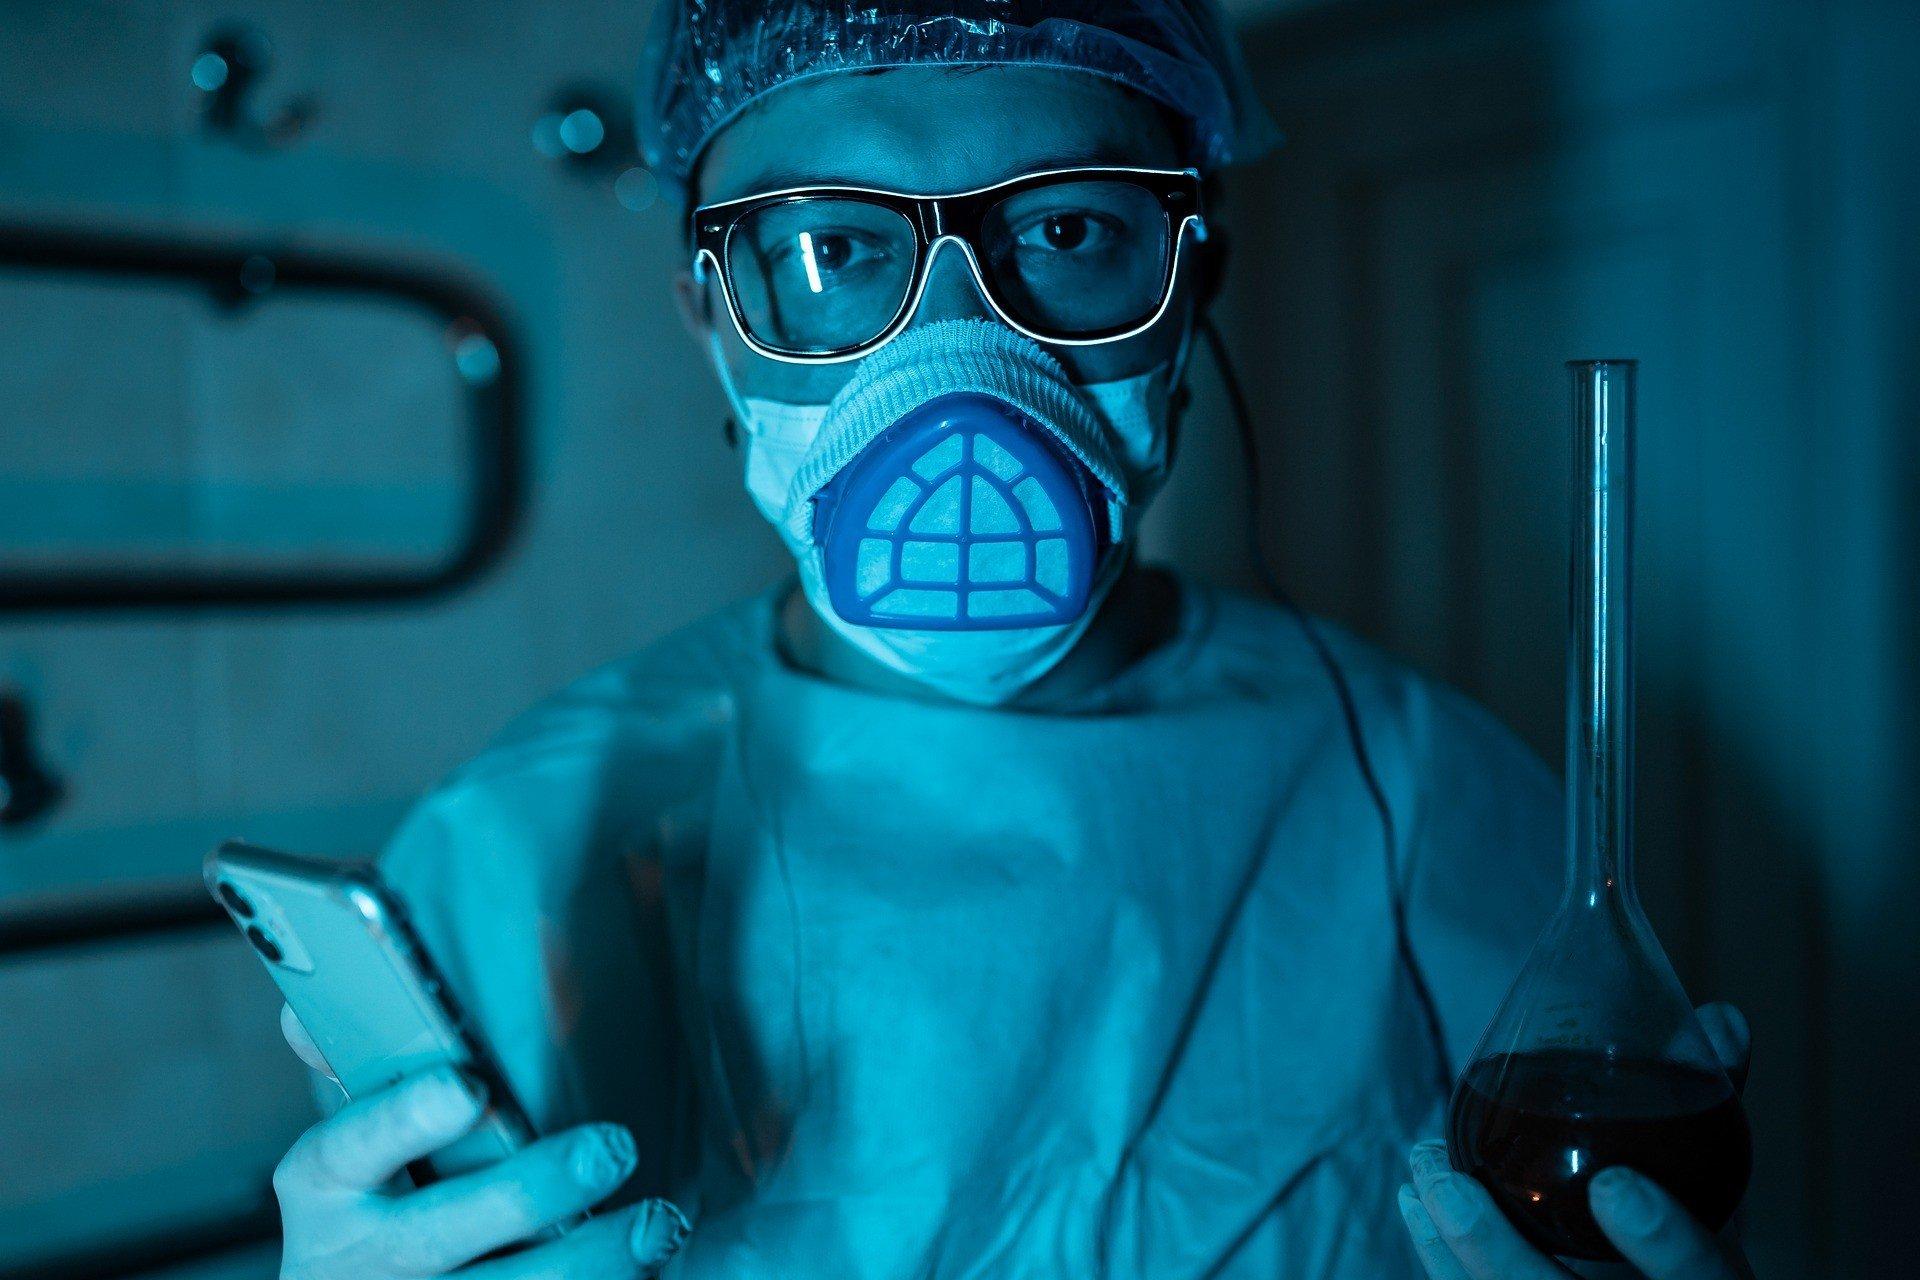 Лаборатория в Ухане: гипотезы возникновения вируса